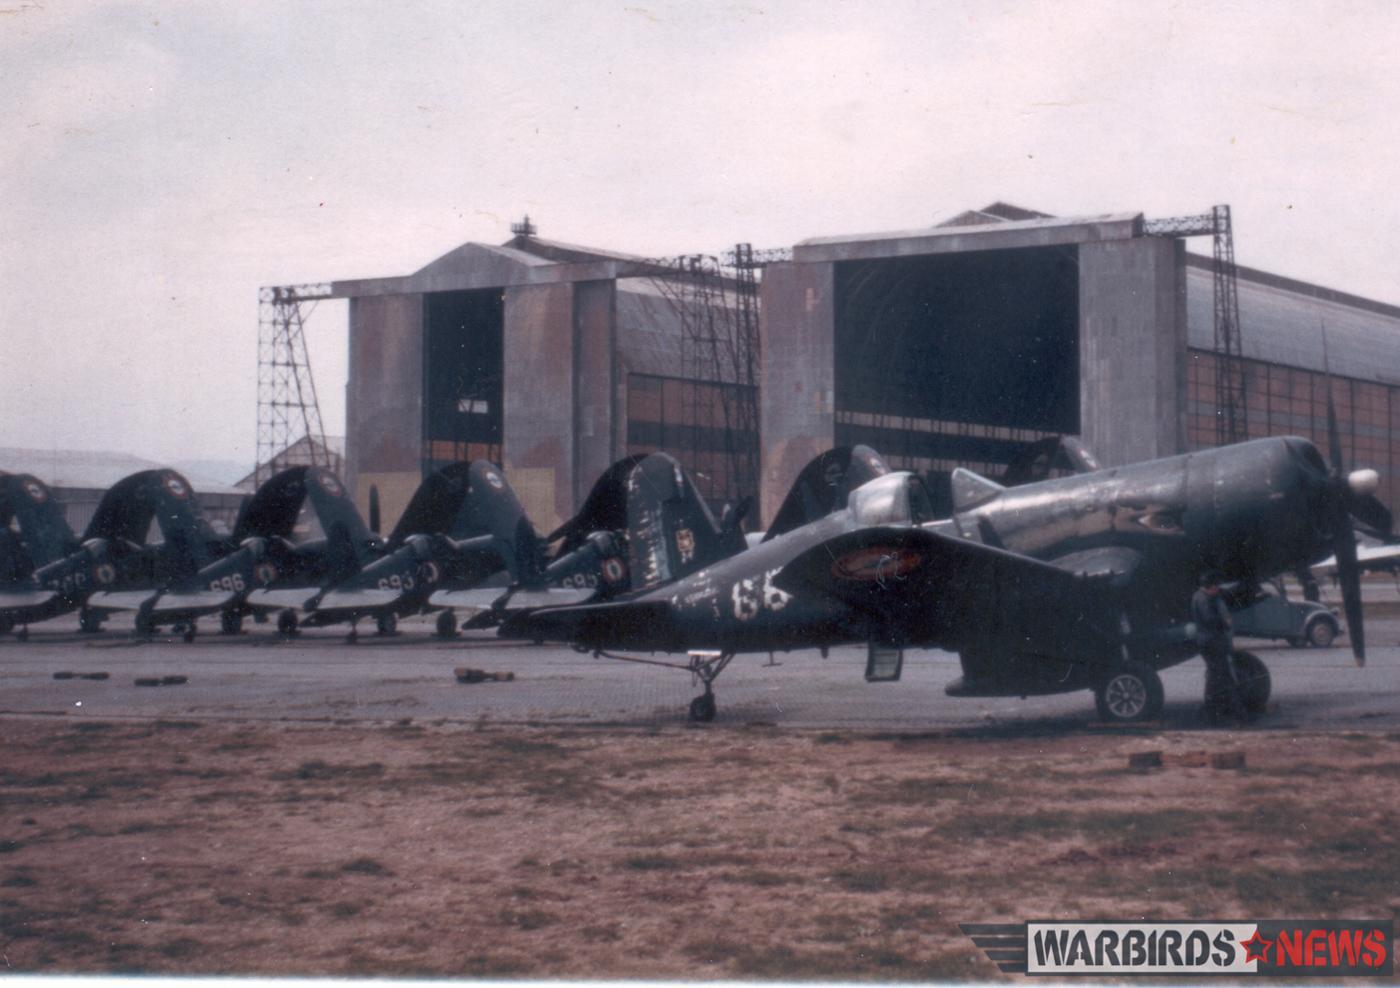 Tired Aeronavale F4U-7 Corsairs in storage in France. (photo via Stephen Chapis)